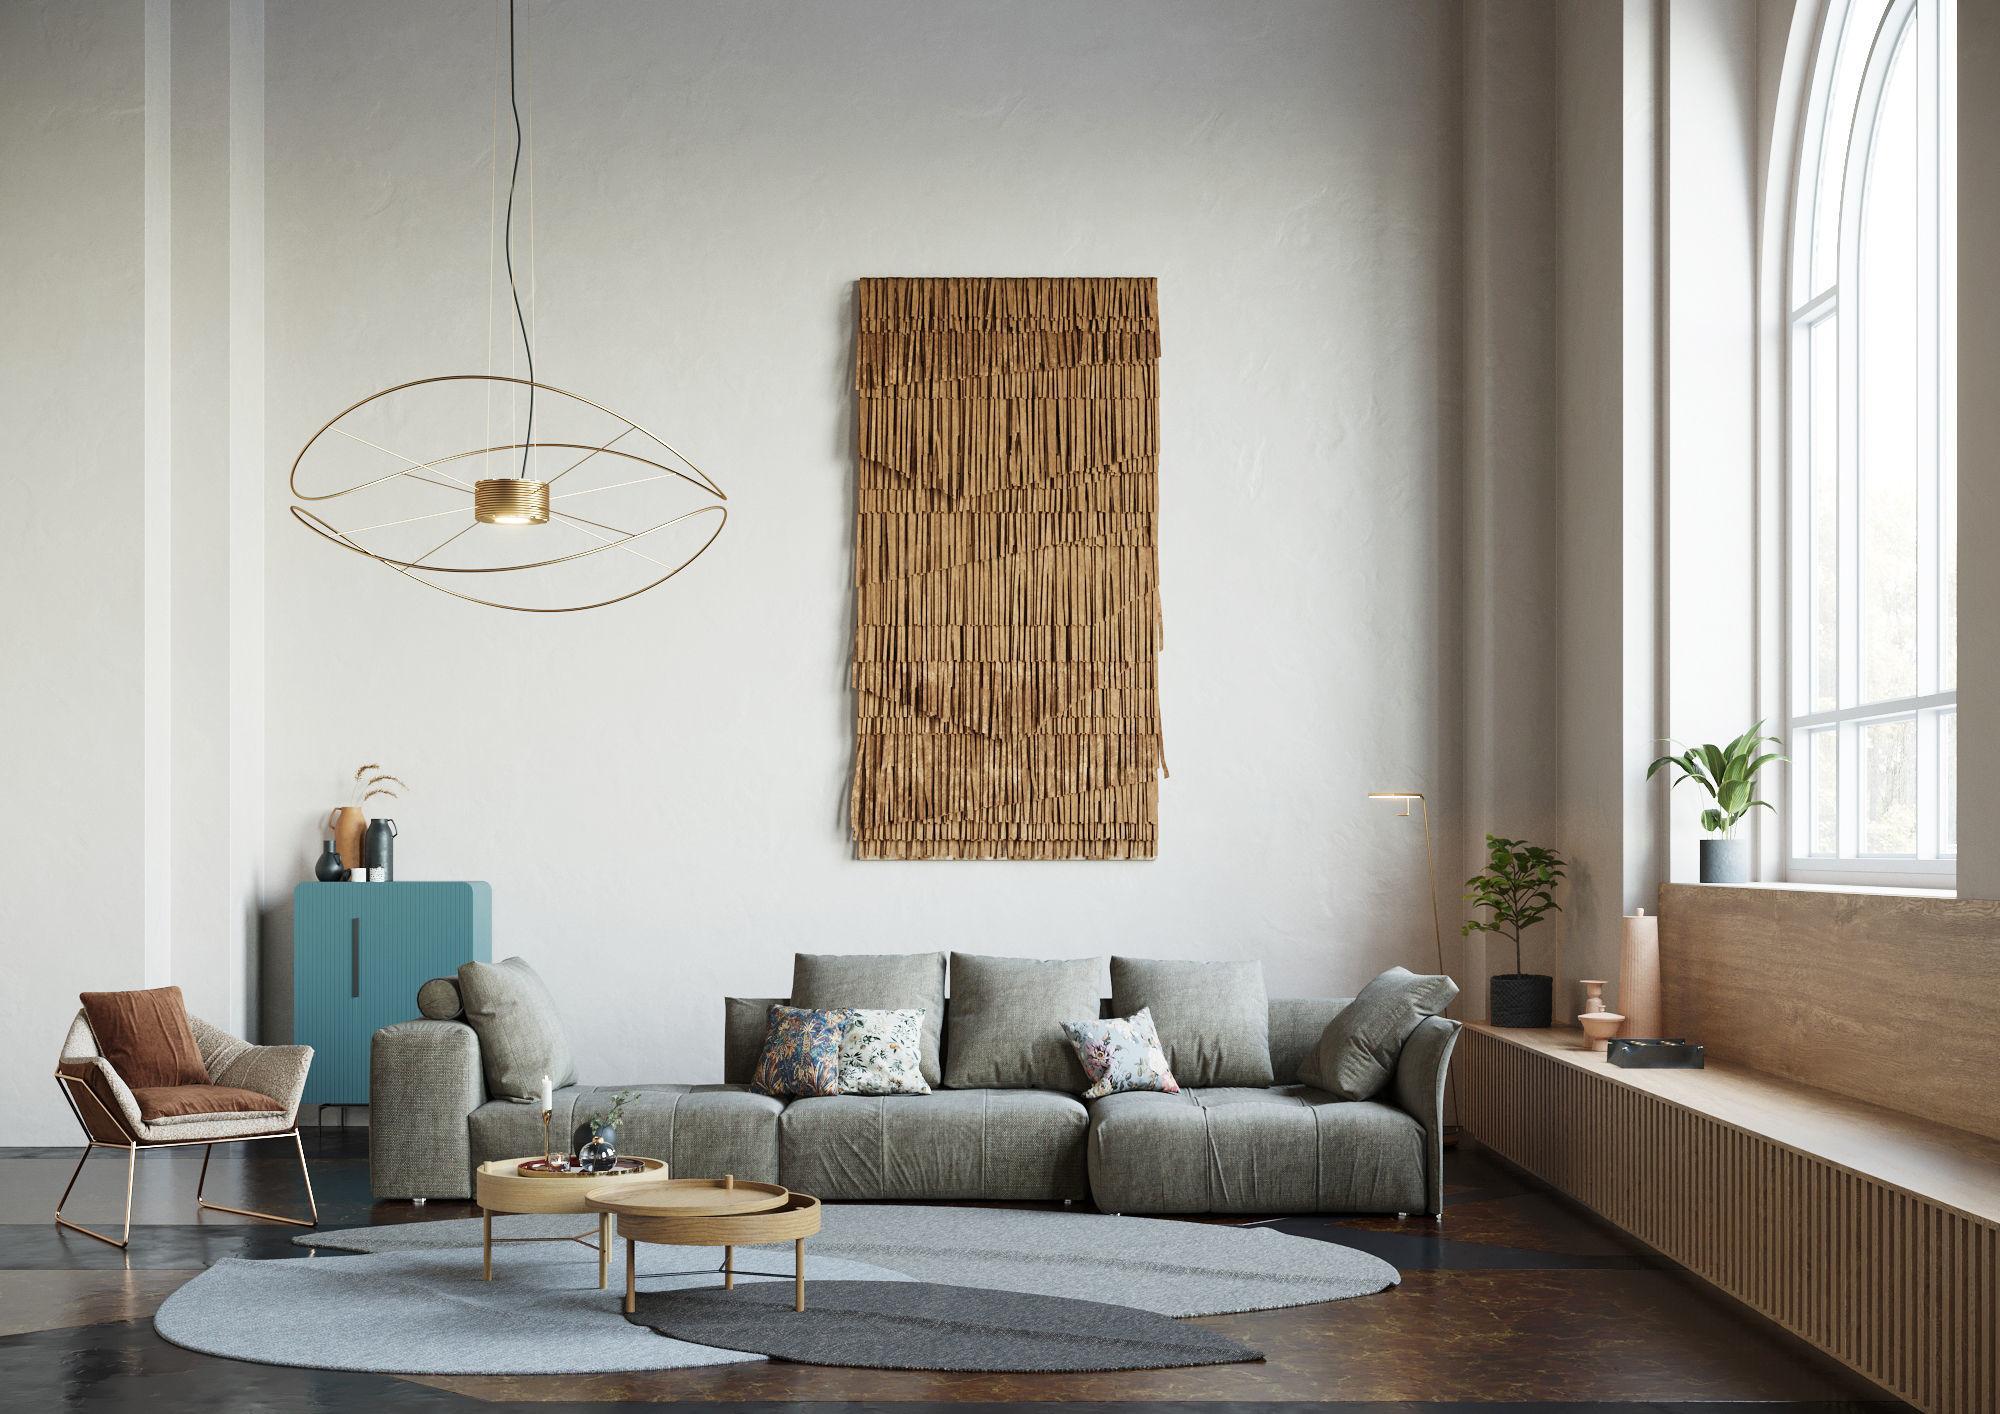 Pixels and Flowers living room interior scene